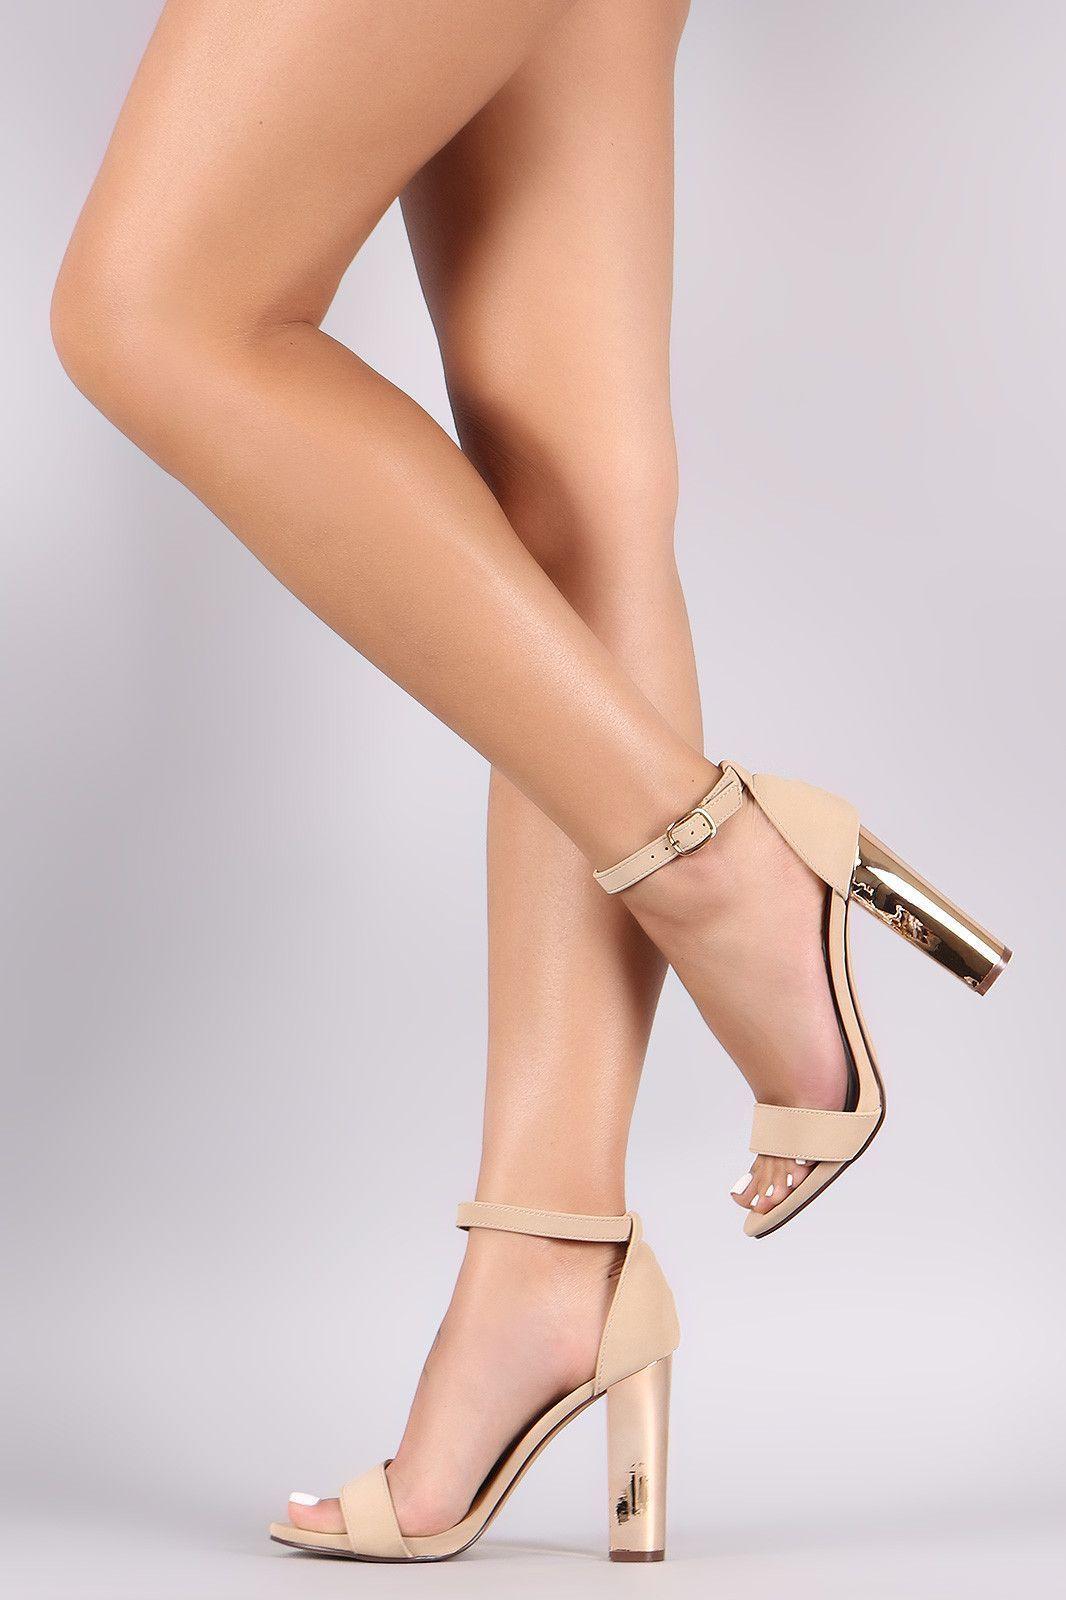 2679f1e84efe Bamboo Nubuck Open Toe Metallic Chunky Heel Ankle Strap Heels